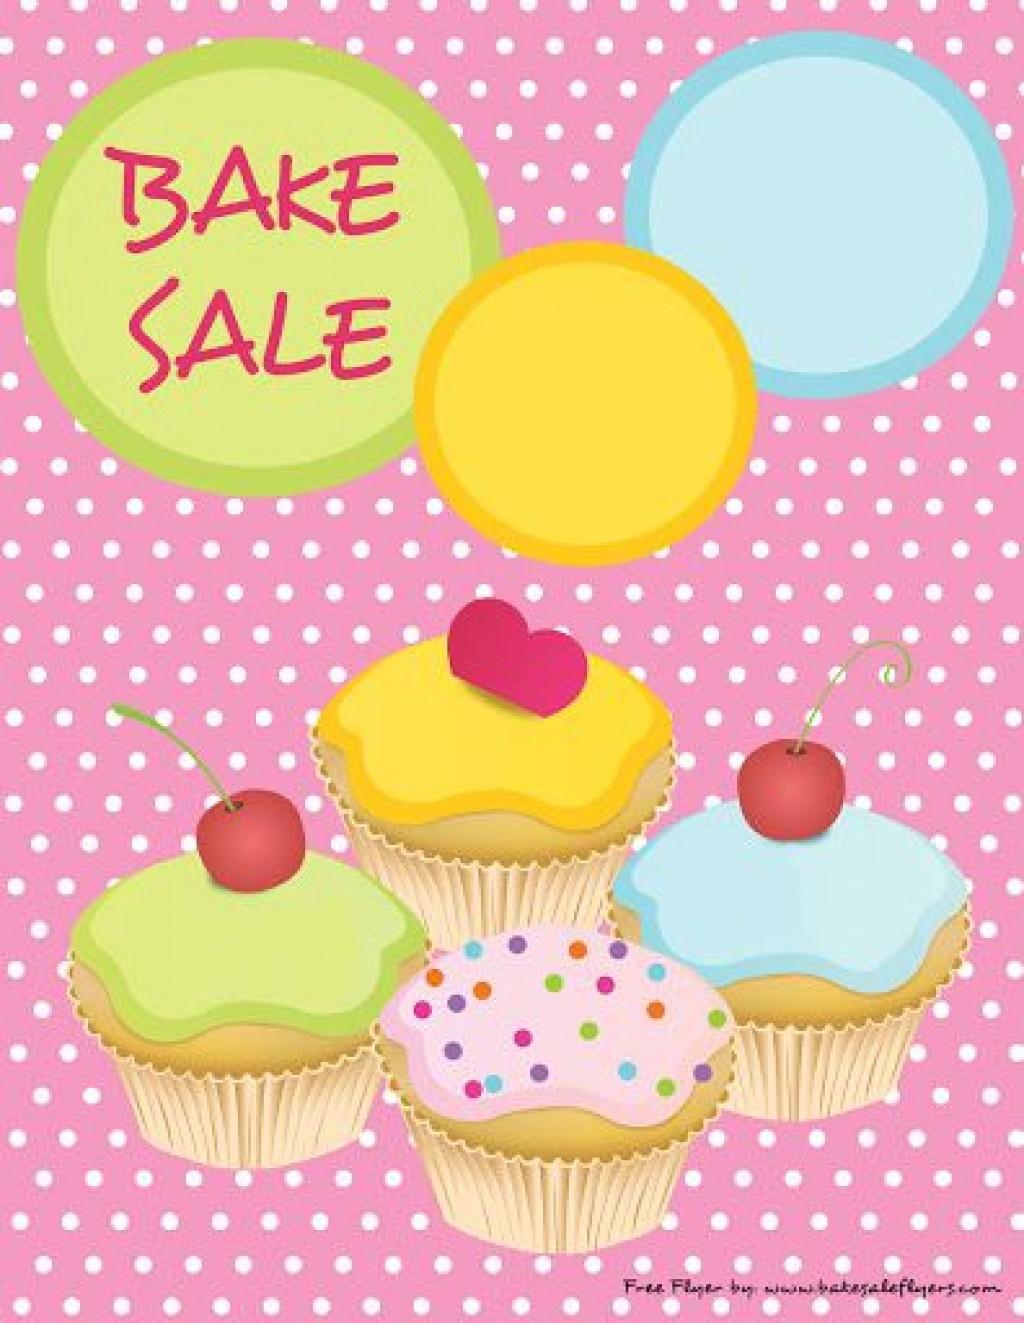 009 Sensational Valentine Bake Sale Flyer Template Free Example  Valentine'Large